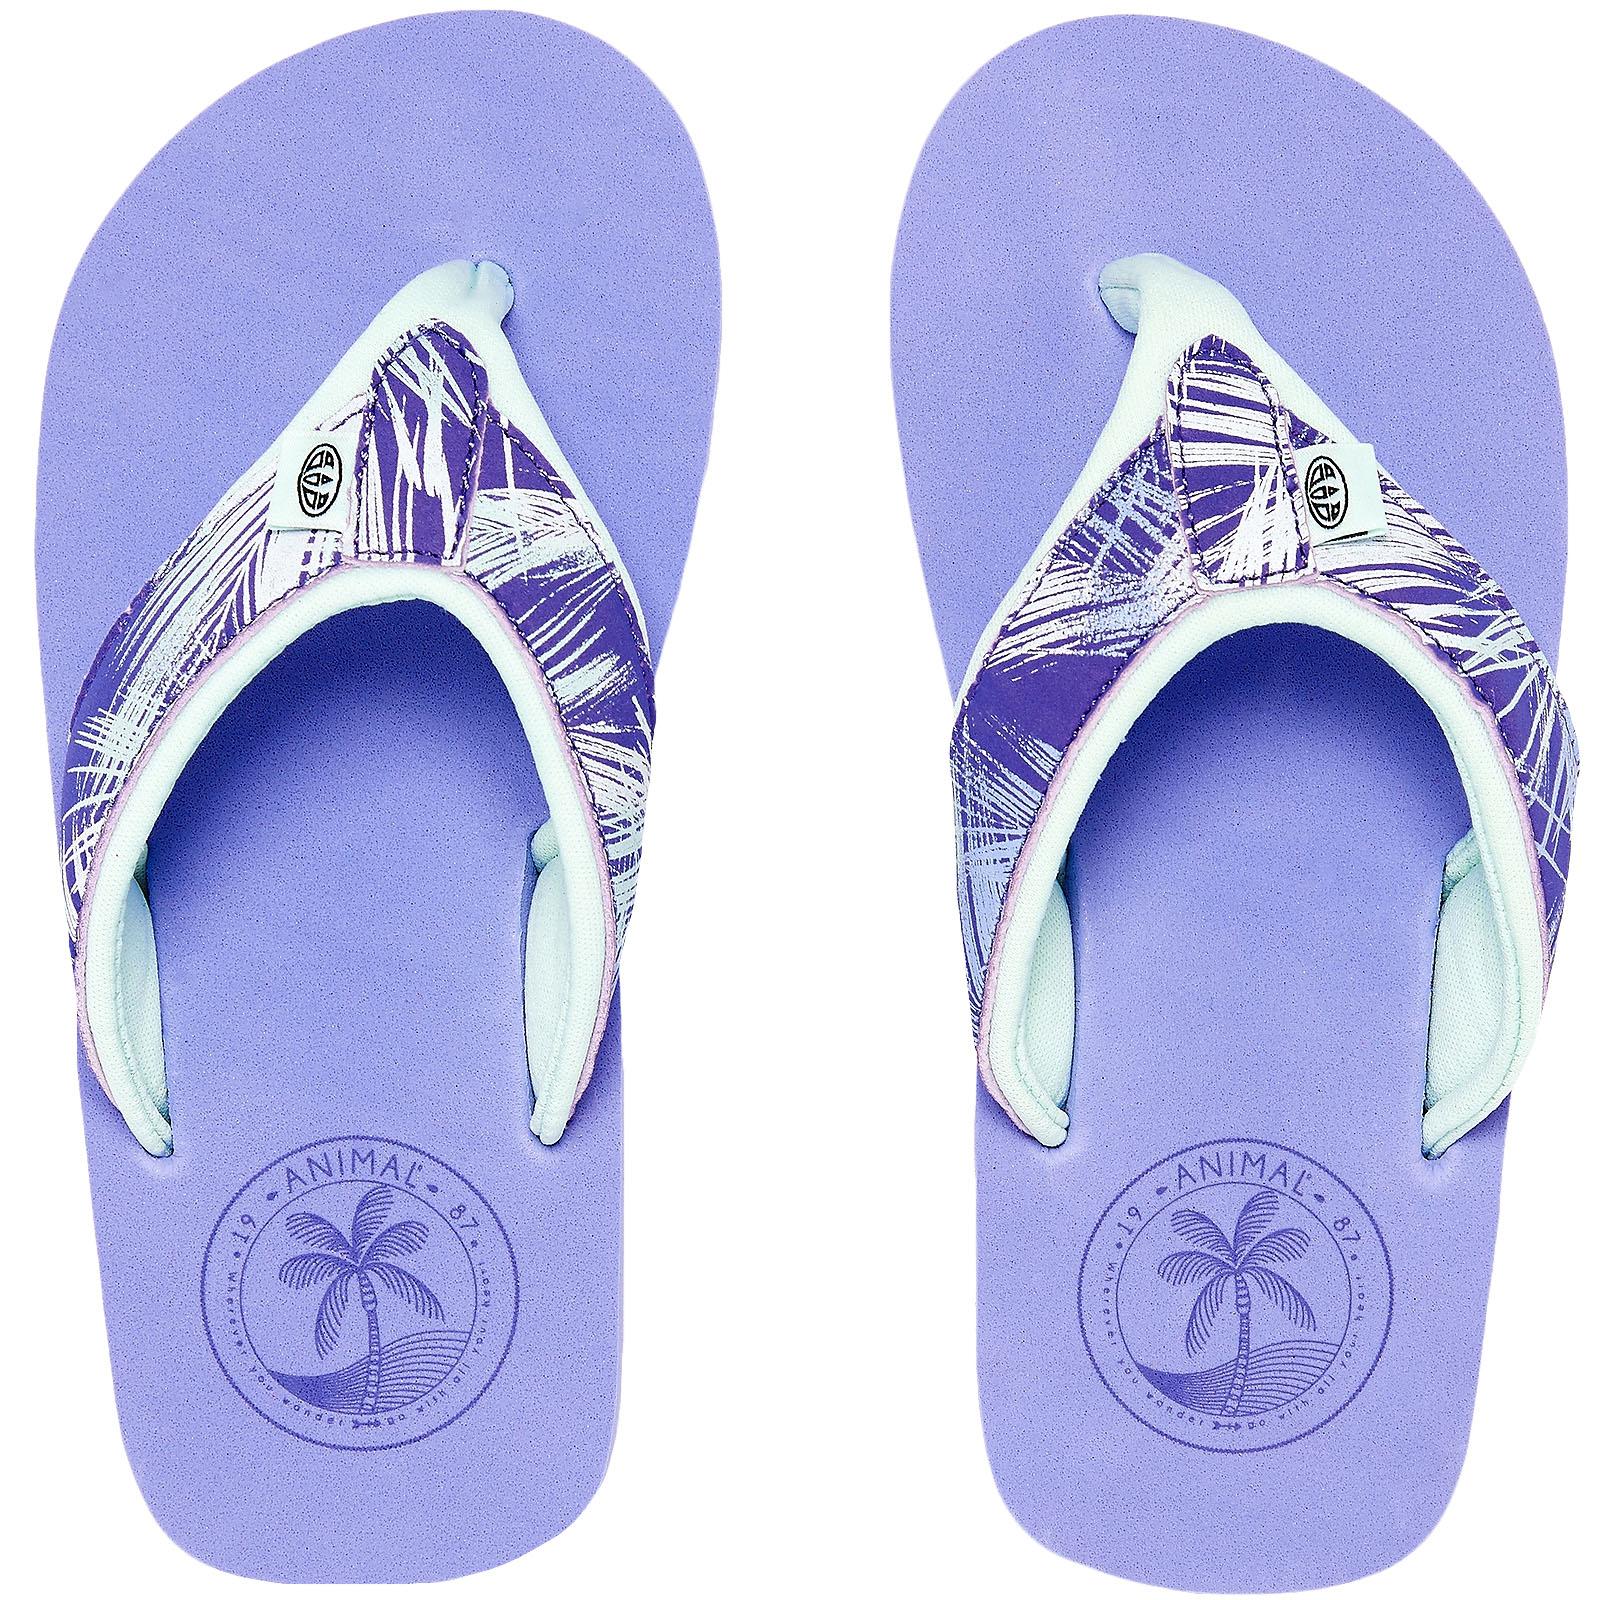 Animal Swish Upper Aop Girls Azul Footwear Sandals - Iris Azul Girls All Talla 1f14ab